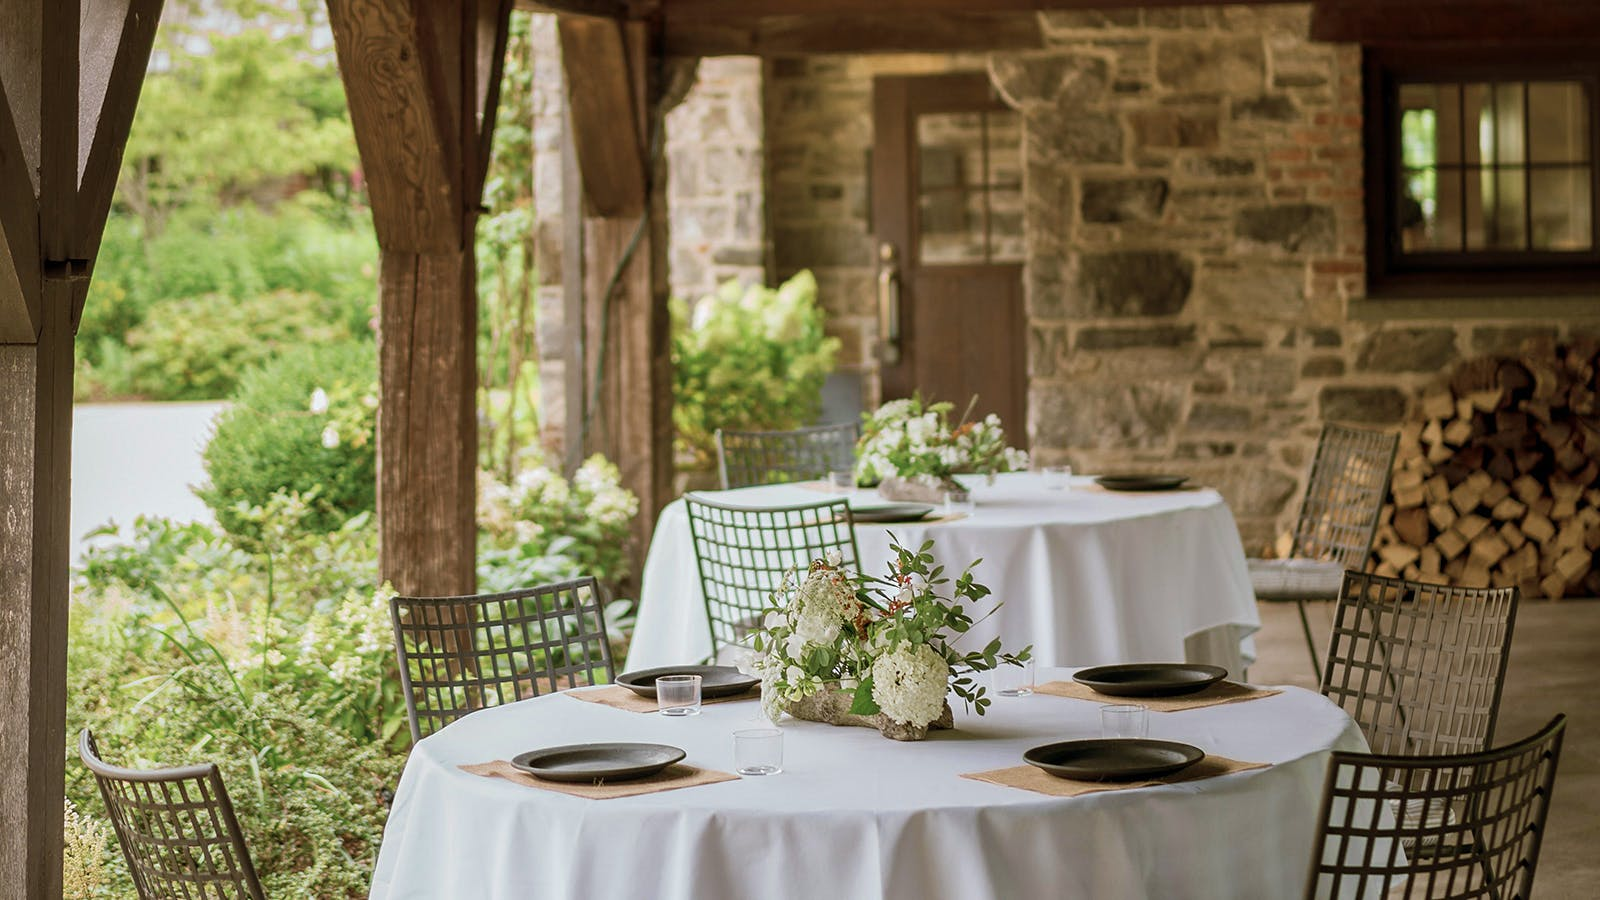 Chef Dan Barber's Blue Hill Restaurants Change Up Concepts